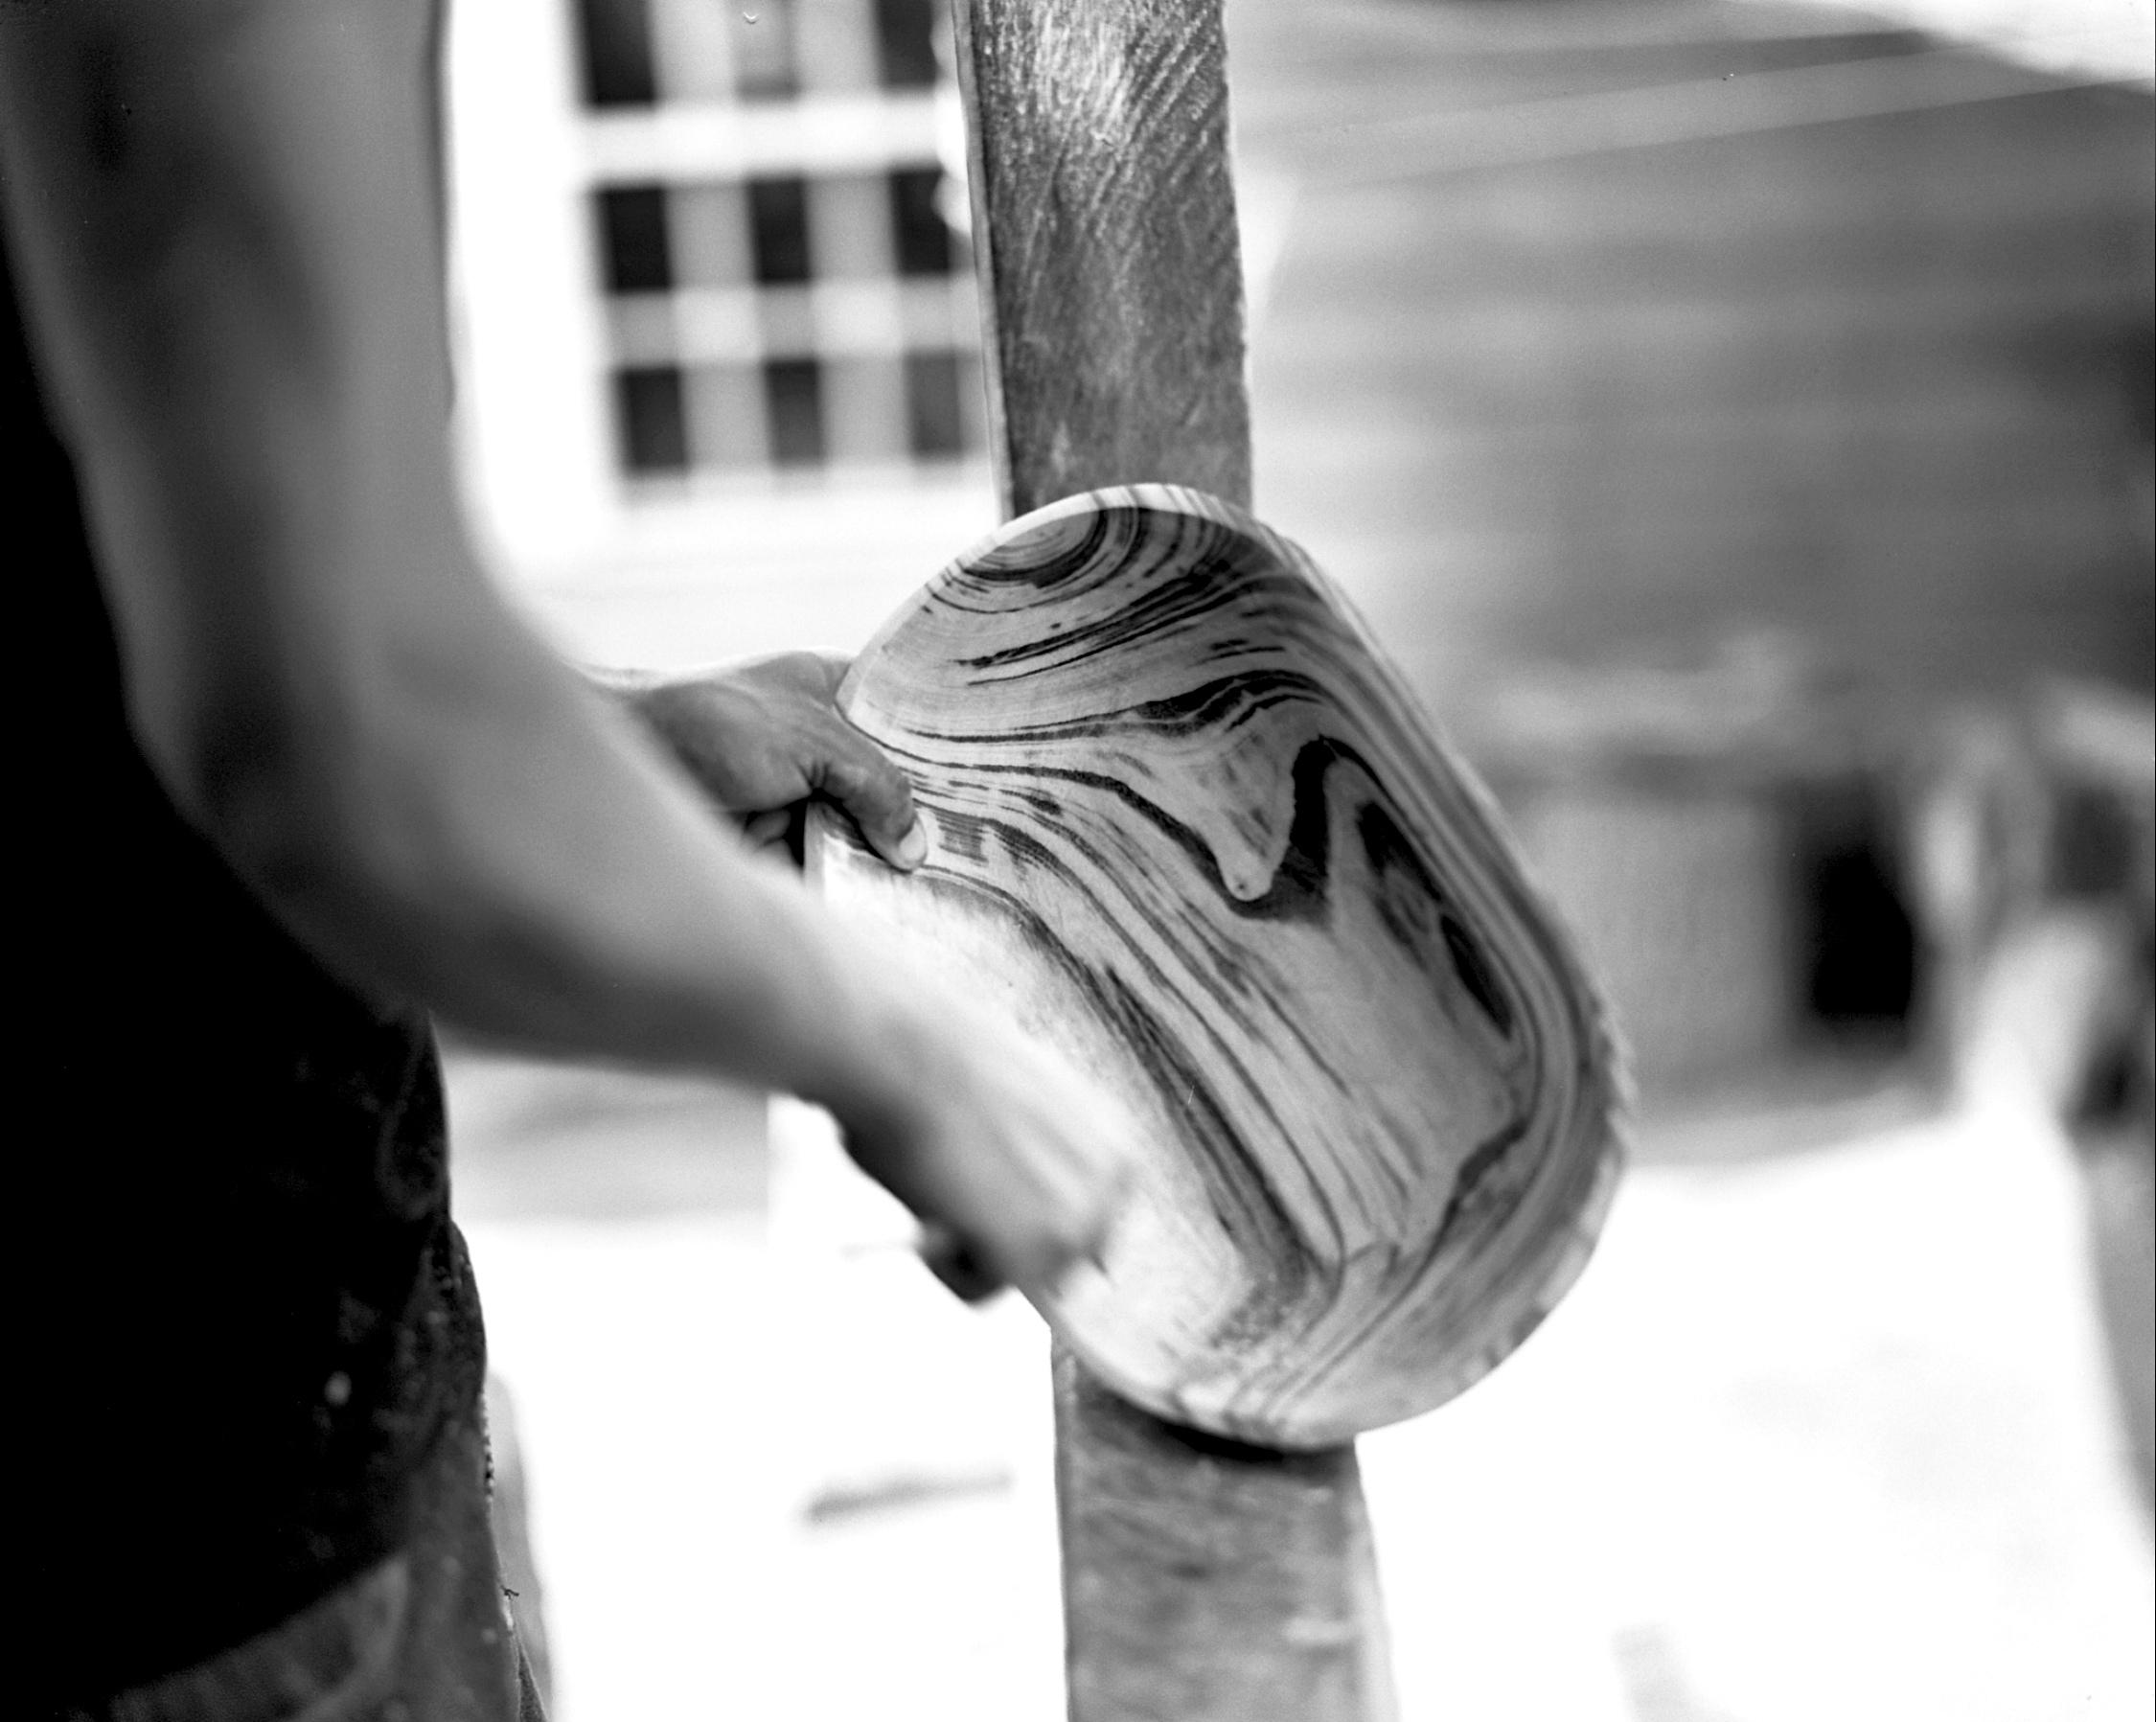 belize-woodworking2